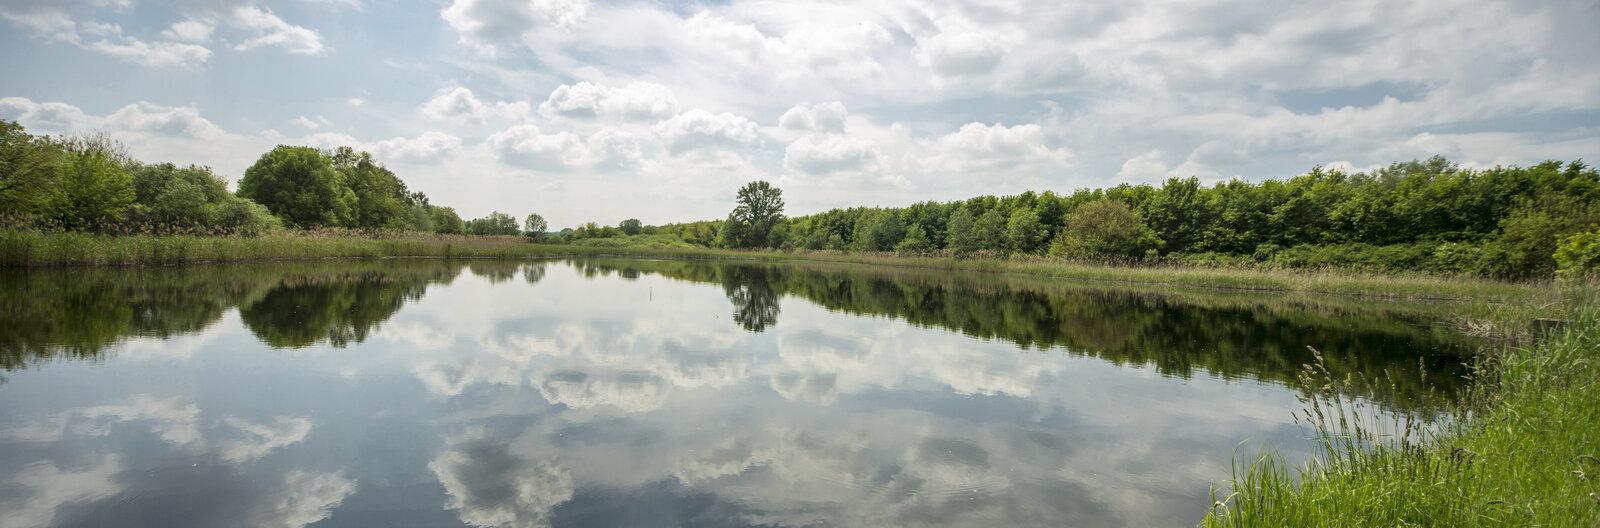 7 great lakes near Balaton